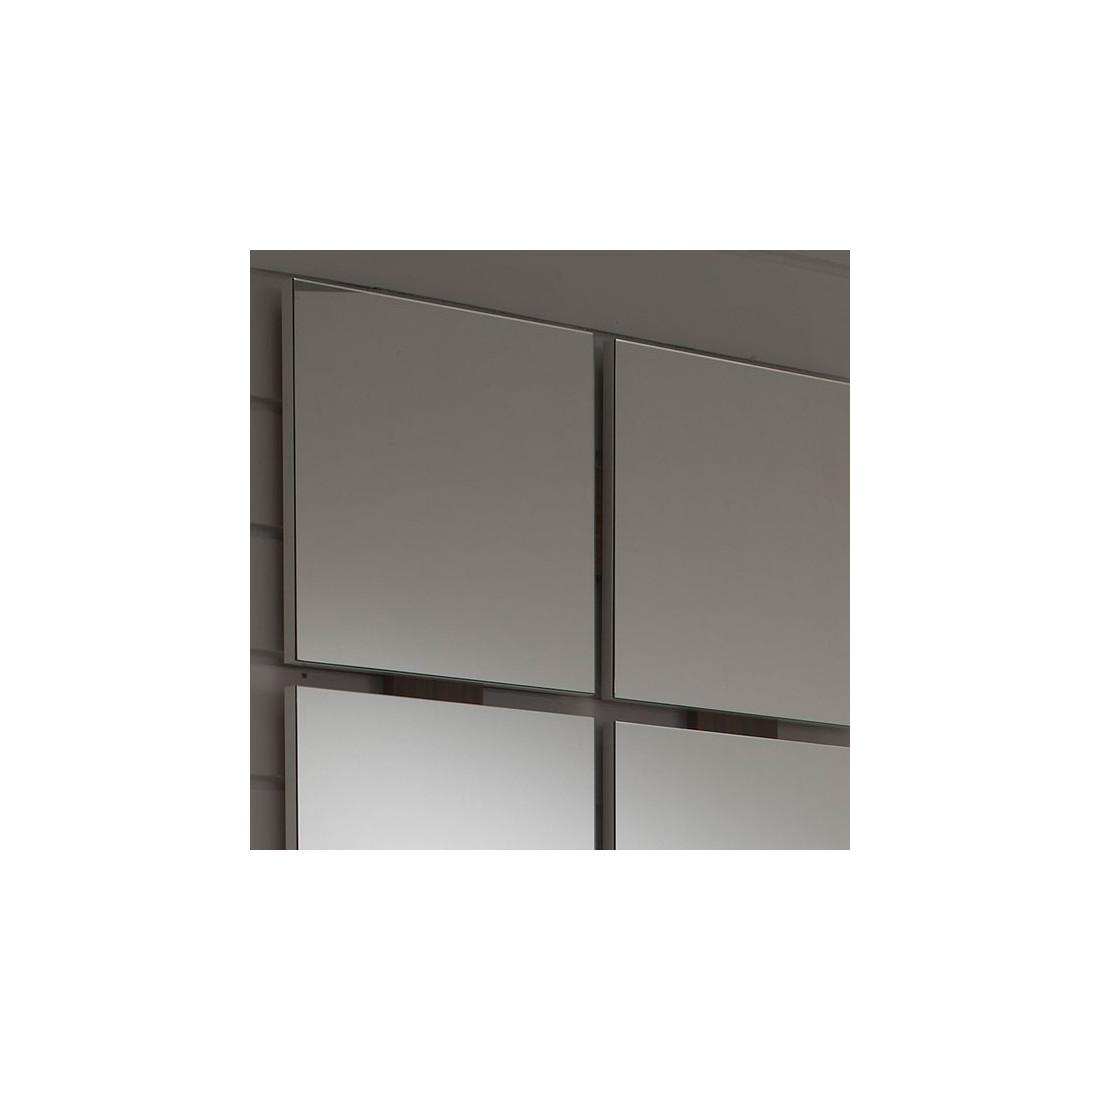 meuble d 39 entr e blanc noyer miroir nave univers petits meubles. Black Bedroom Furniture Sets. Home Design Ideas